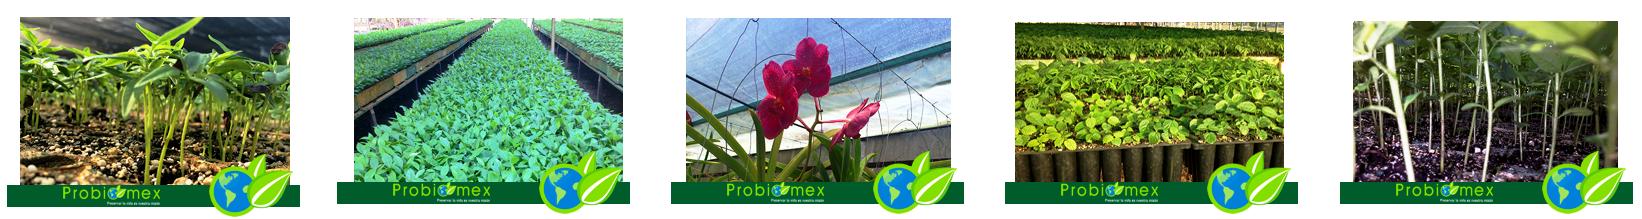 home probiomex2